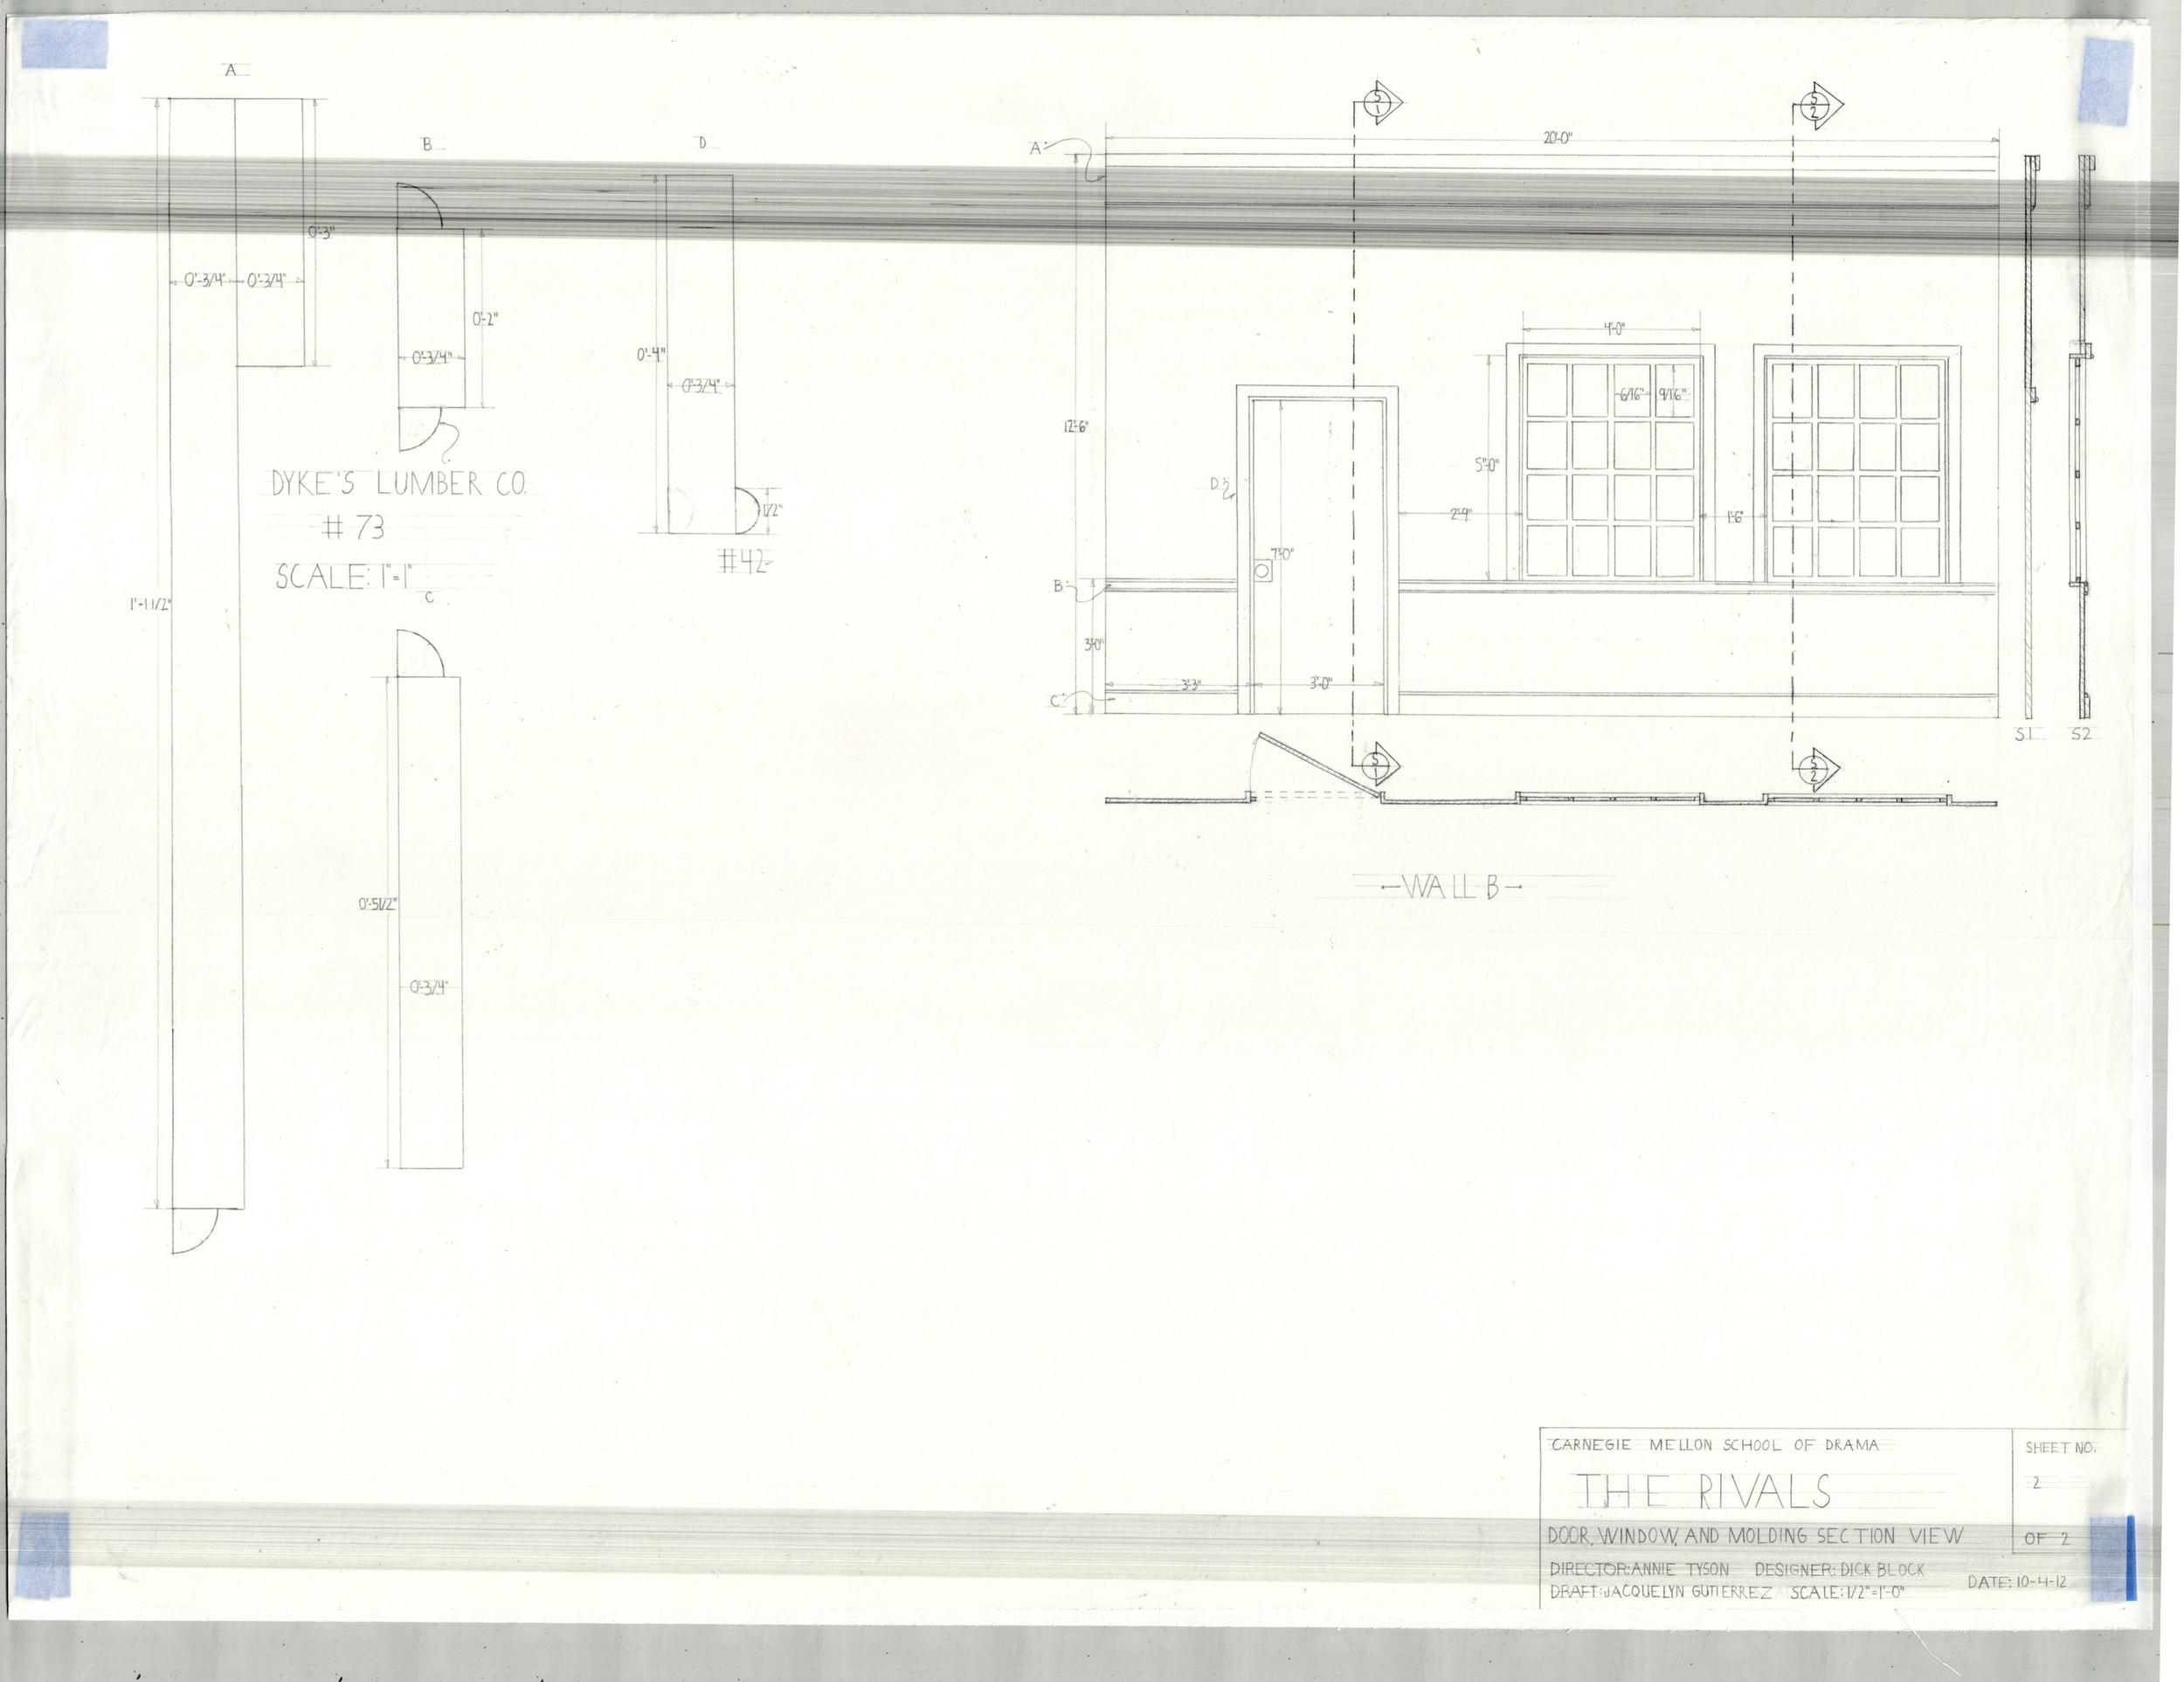 doorwalldraft copy 2.jpg